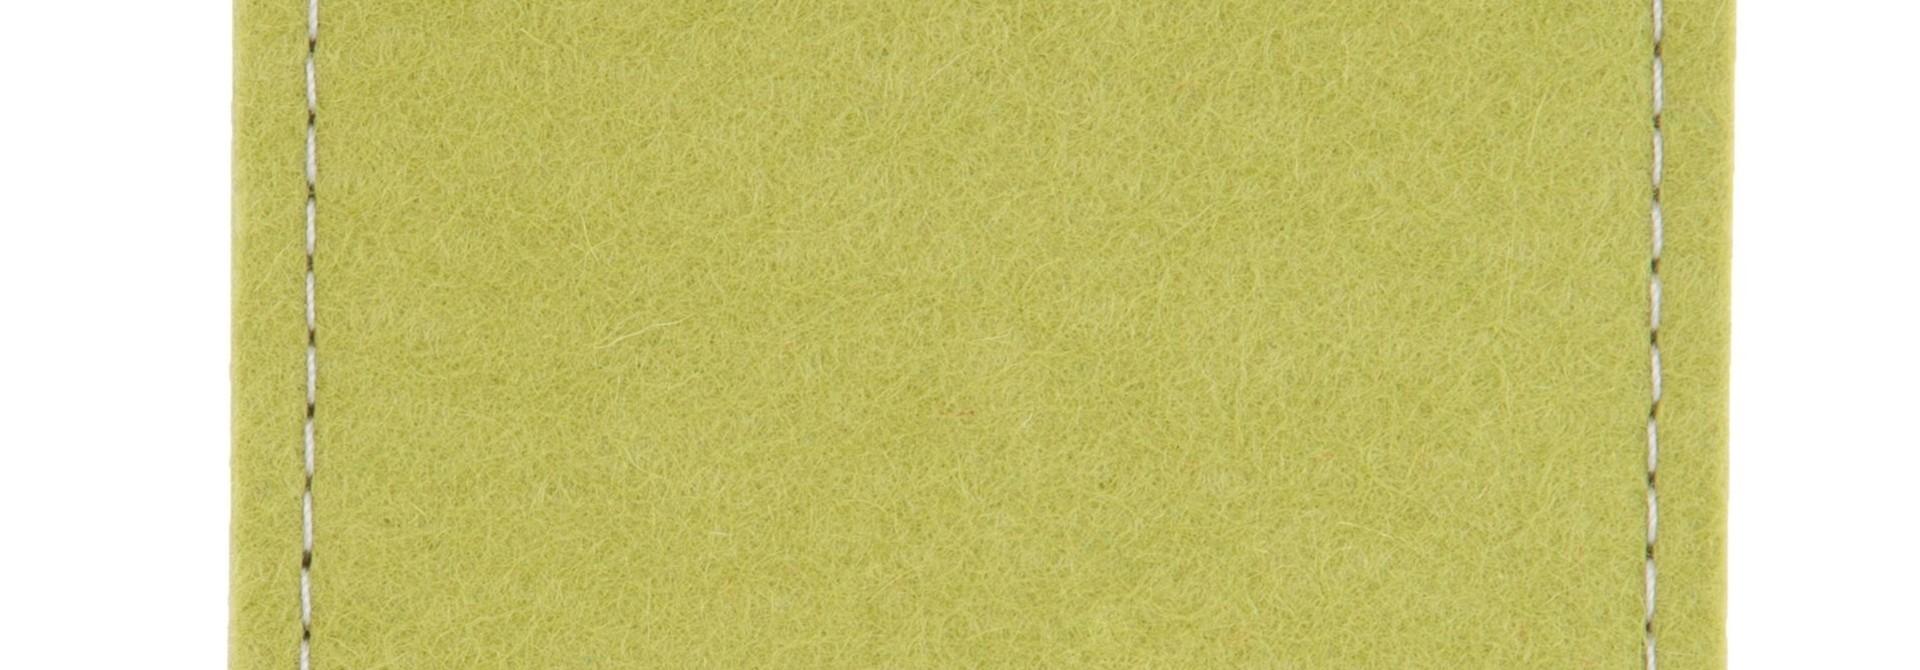 Xperia Sleeve Lime-Green